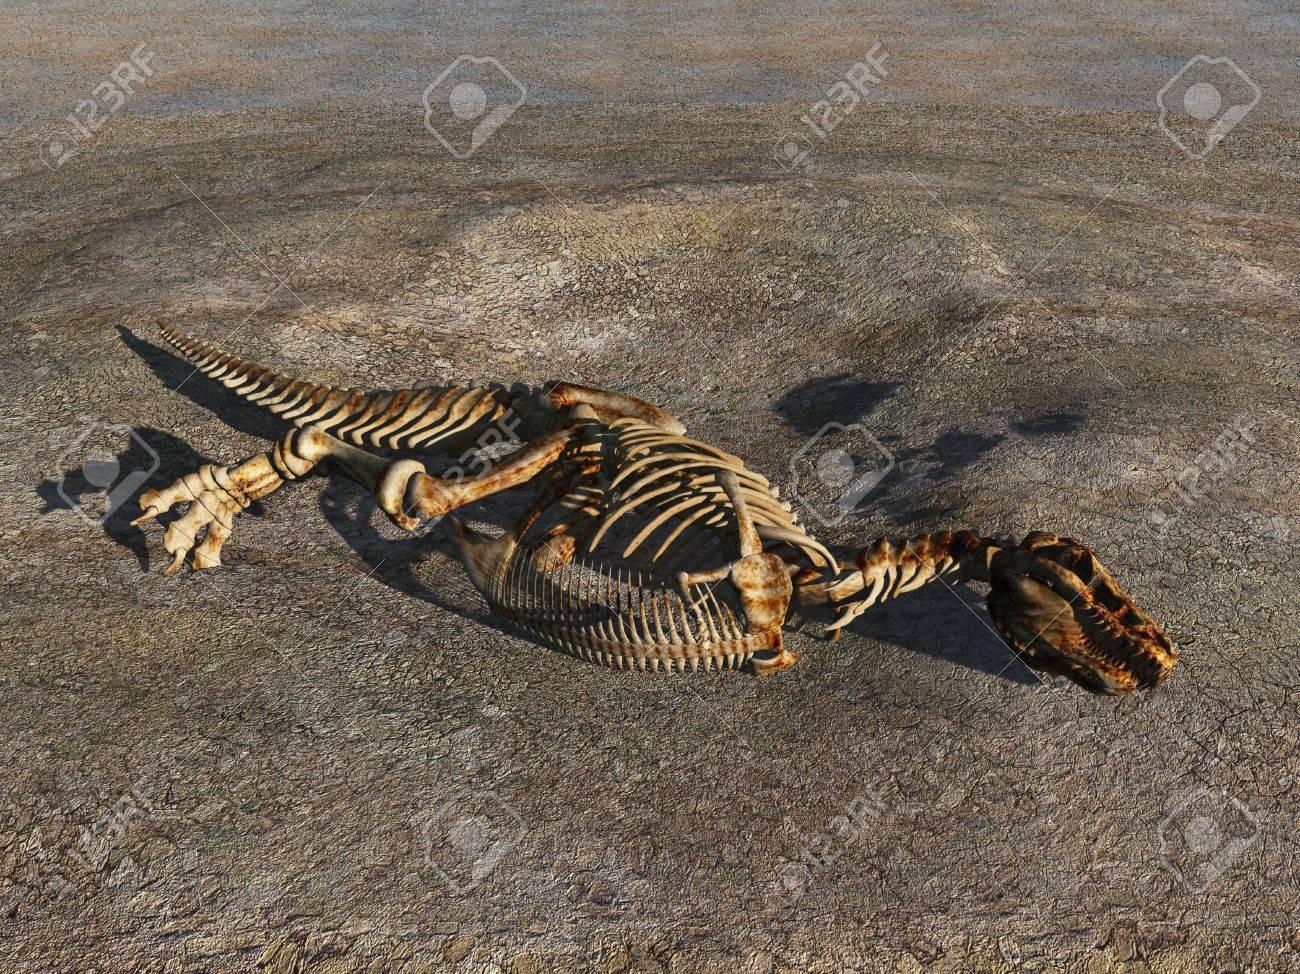 3d Ilustración De Un Esqueleto De Dinosaurio Fotos, Retratos ...